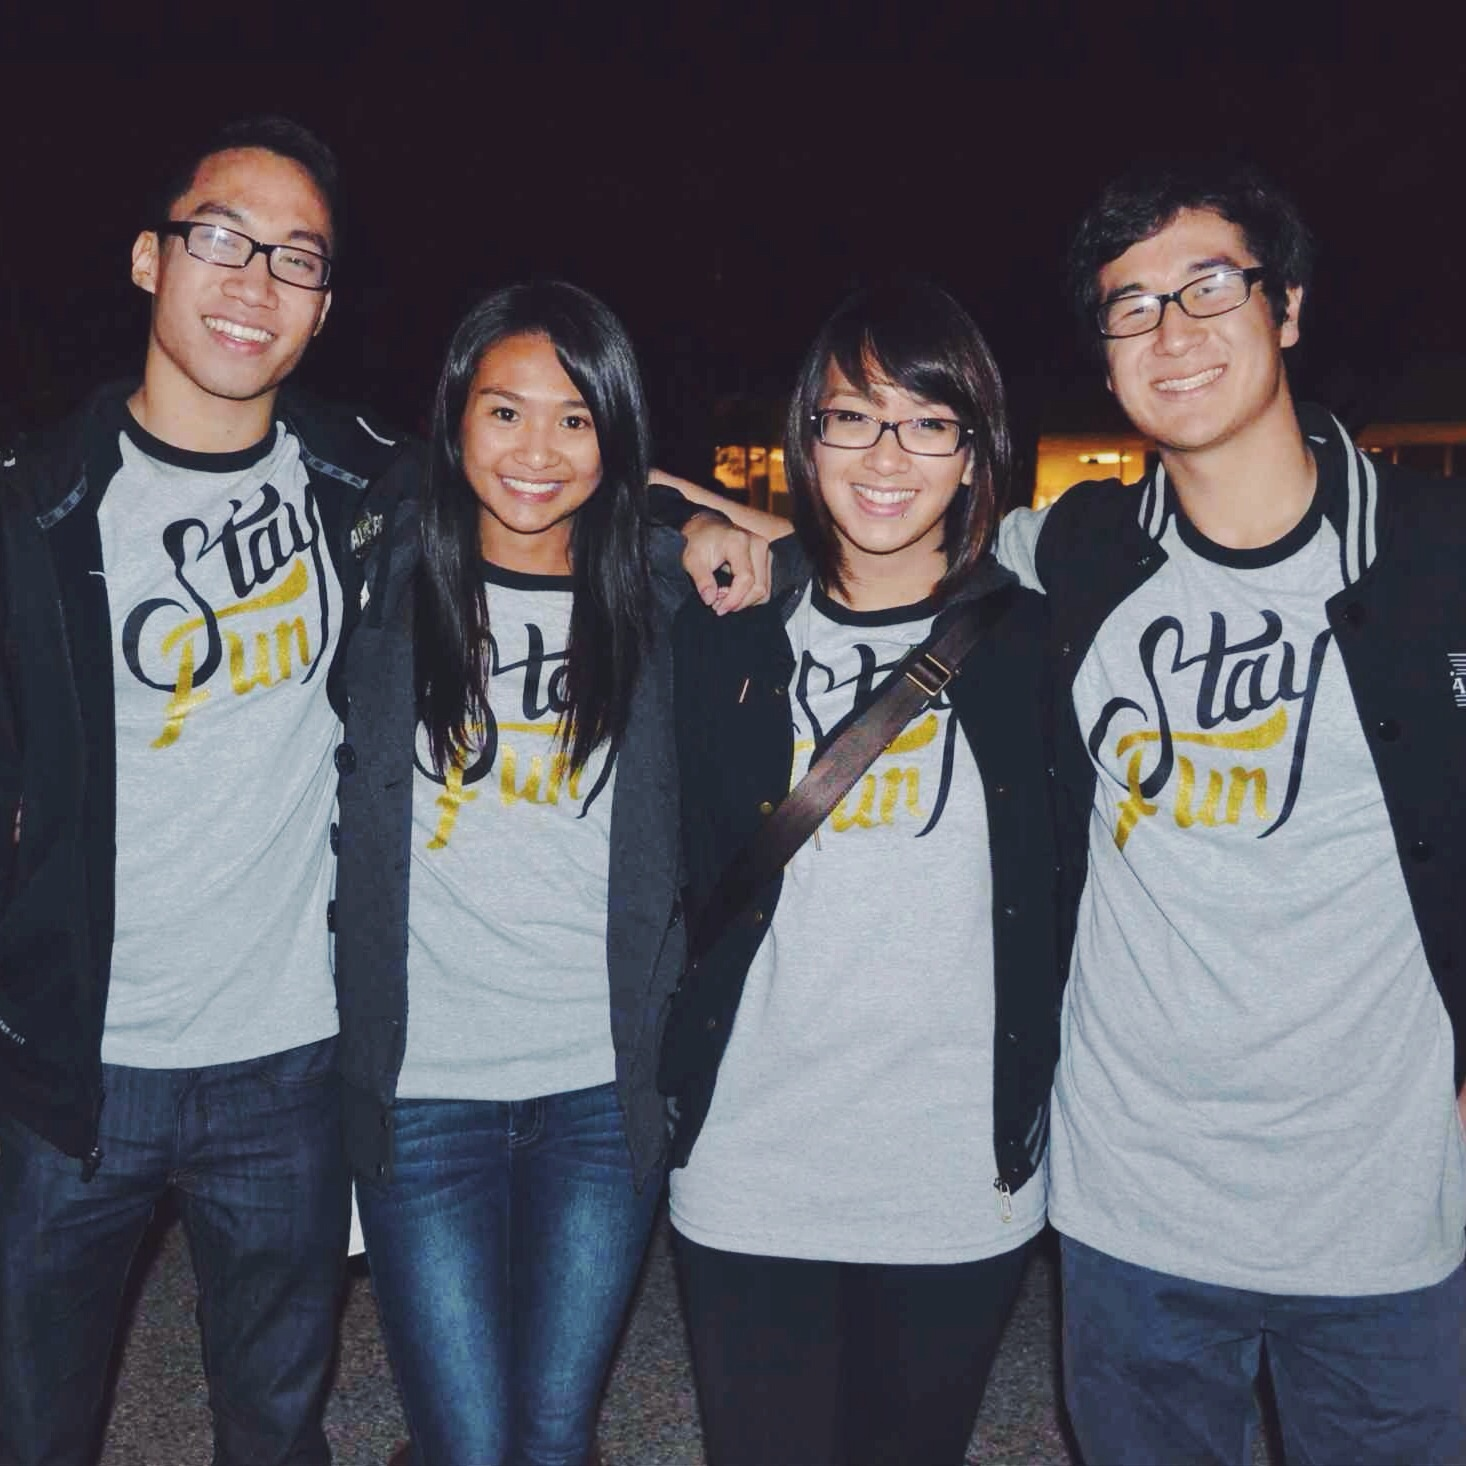 Custom T-Shirts for Fun Line! - Shirt Design Ideas